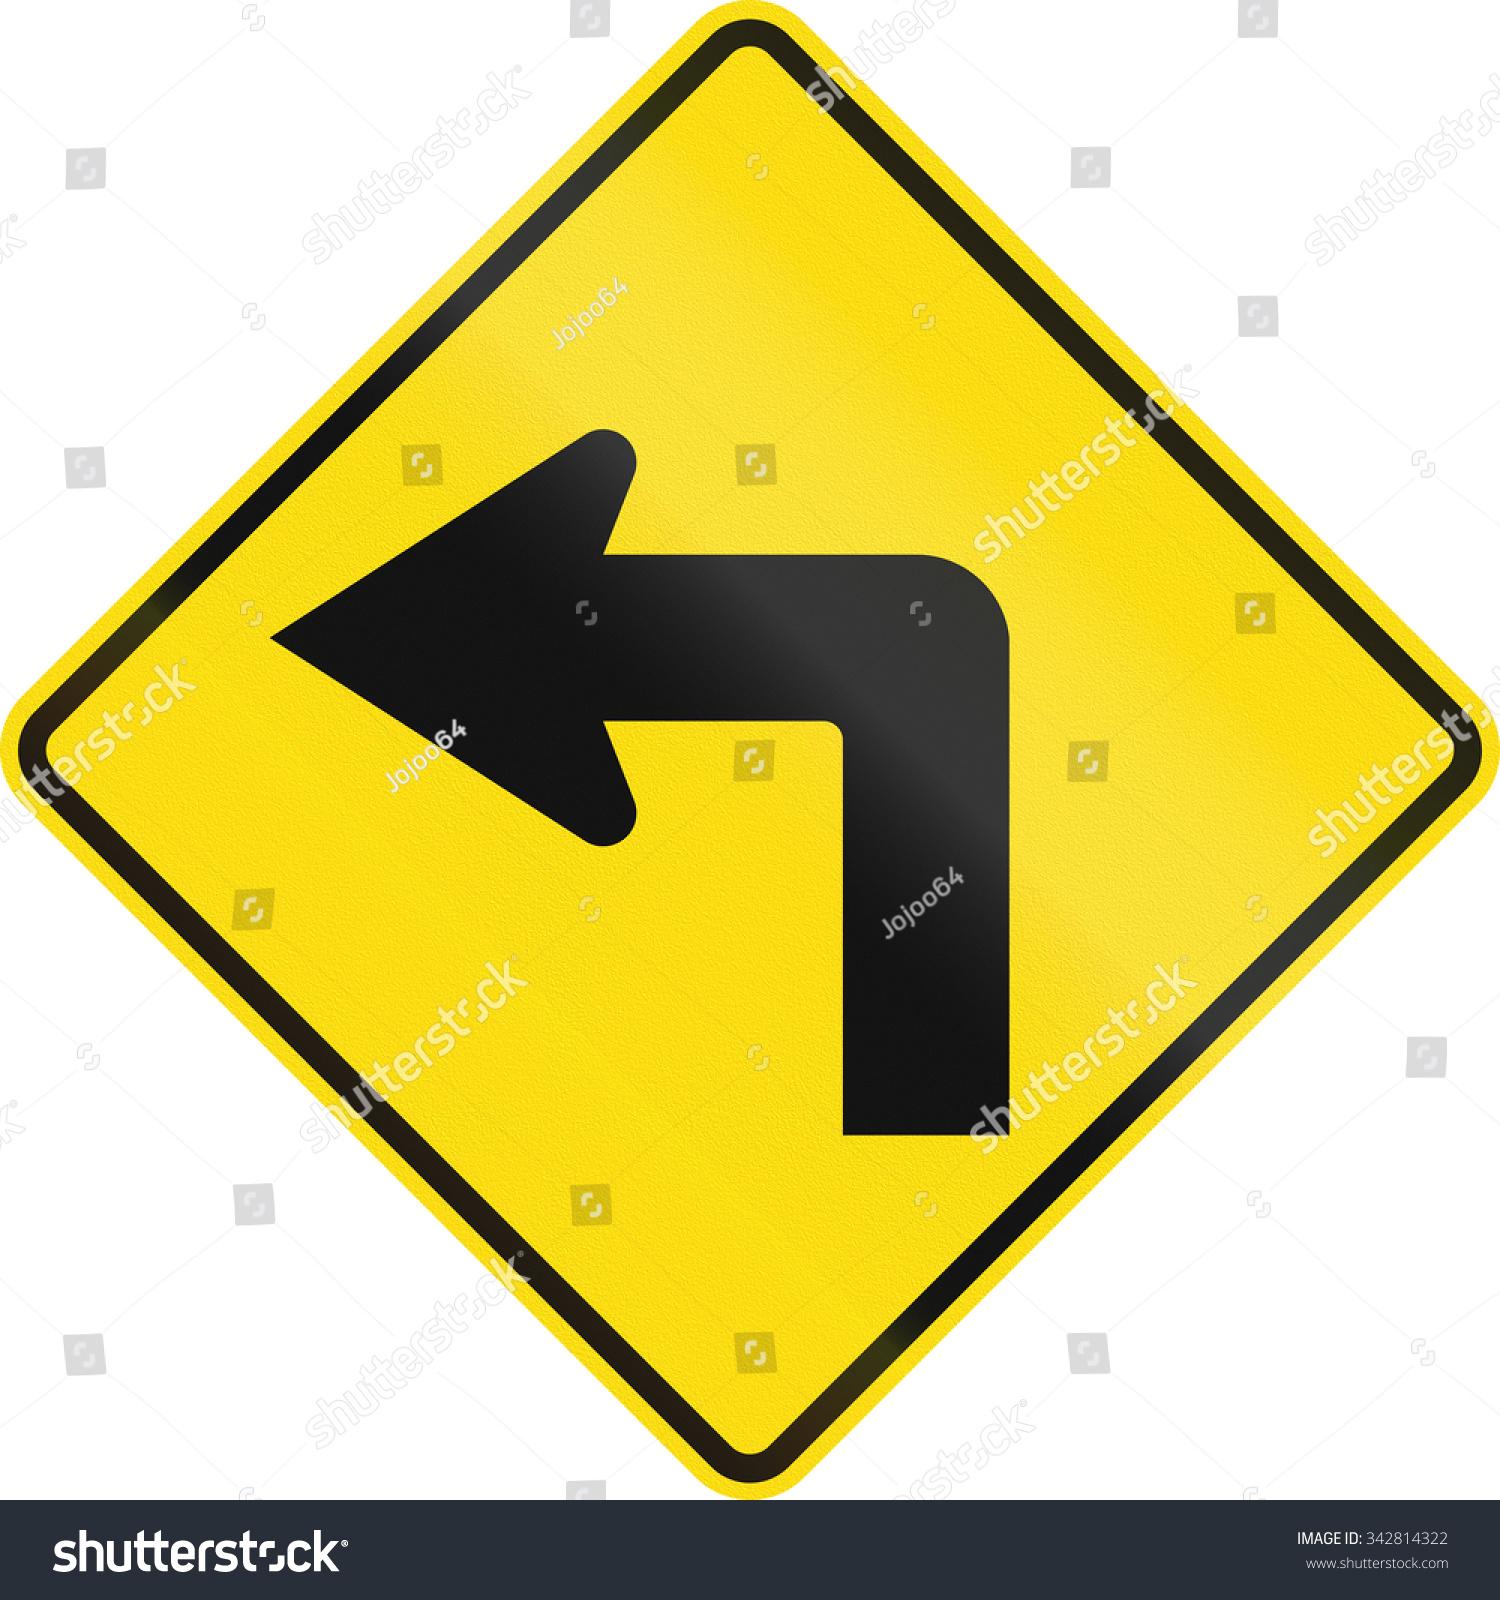 Sharp stock symbol image collections symbol and sign ideas sharp stock symbol gallery symbol and sign ideas new zealand road sign pw16 sharp stock illustration buycottarizona